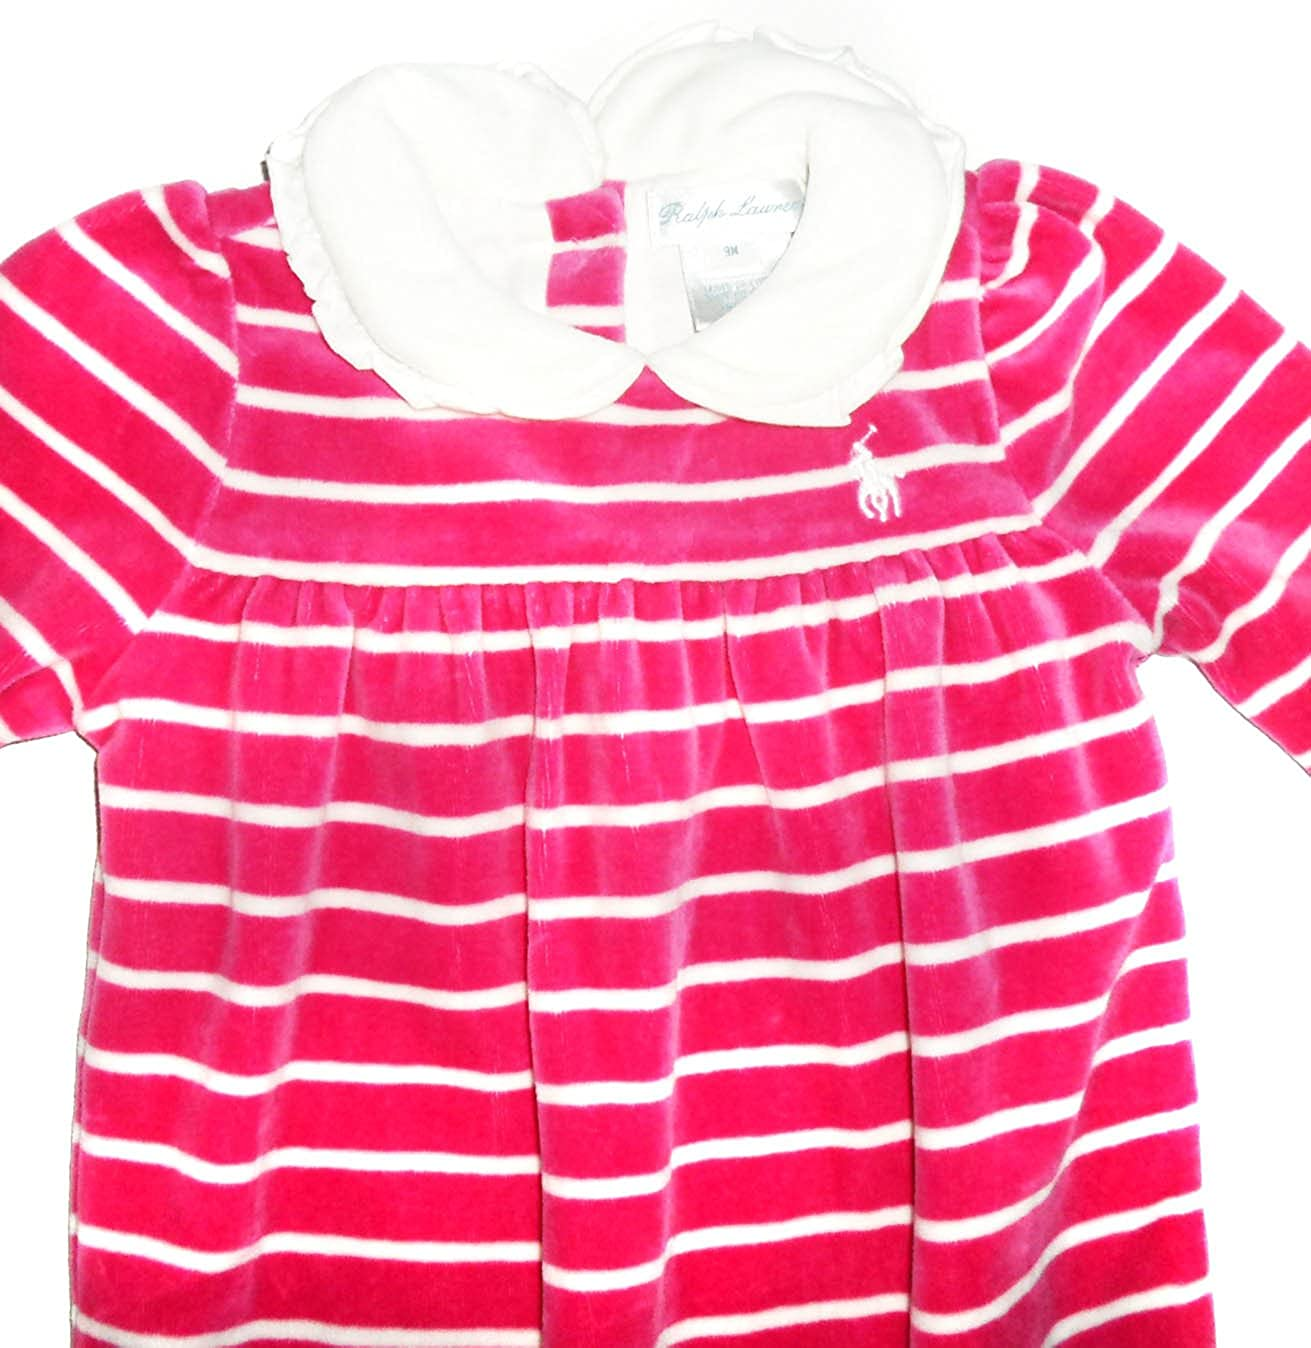 8ed9c72f2 Ralph Lauren New Genuine Baby Girls Pink Velvet Babygrow Playsuit - 70002 (9  Months)  Amazon.co.uk  Clothing